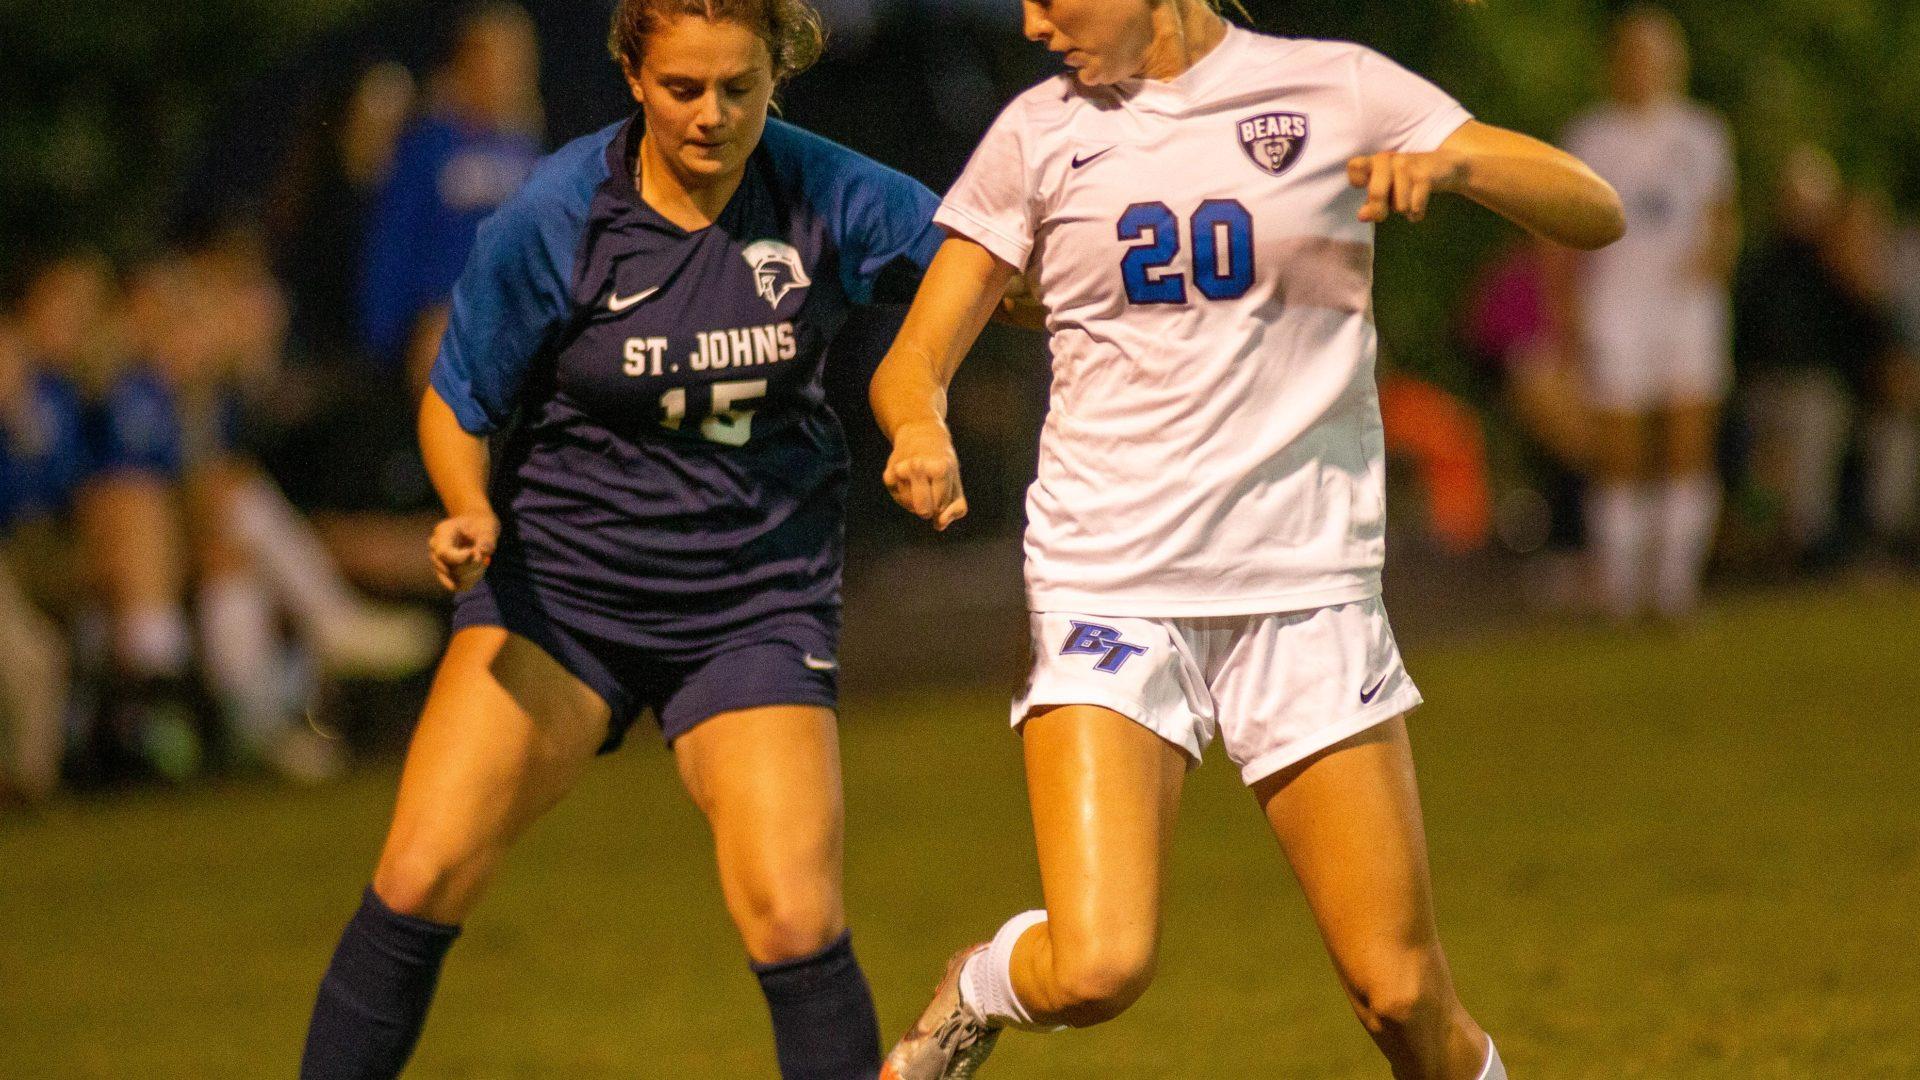 FHSAA final regular season girls soccer rankings